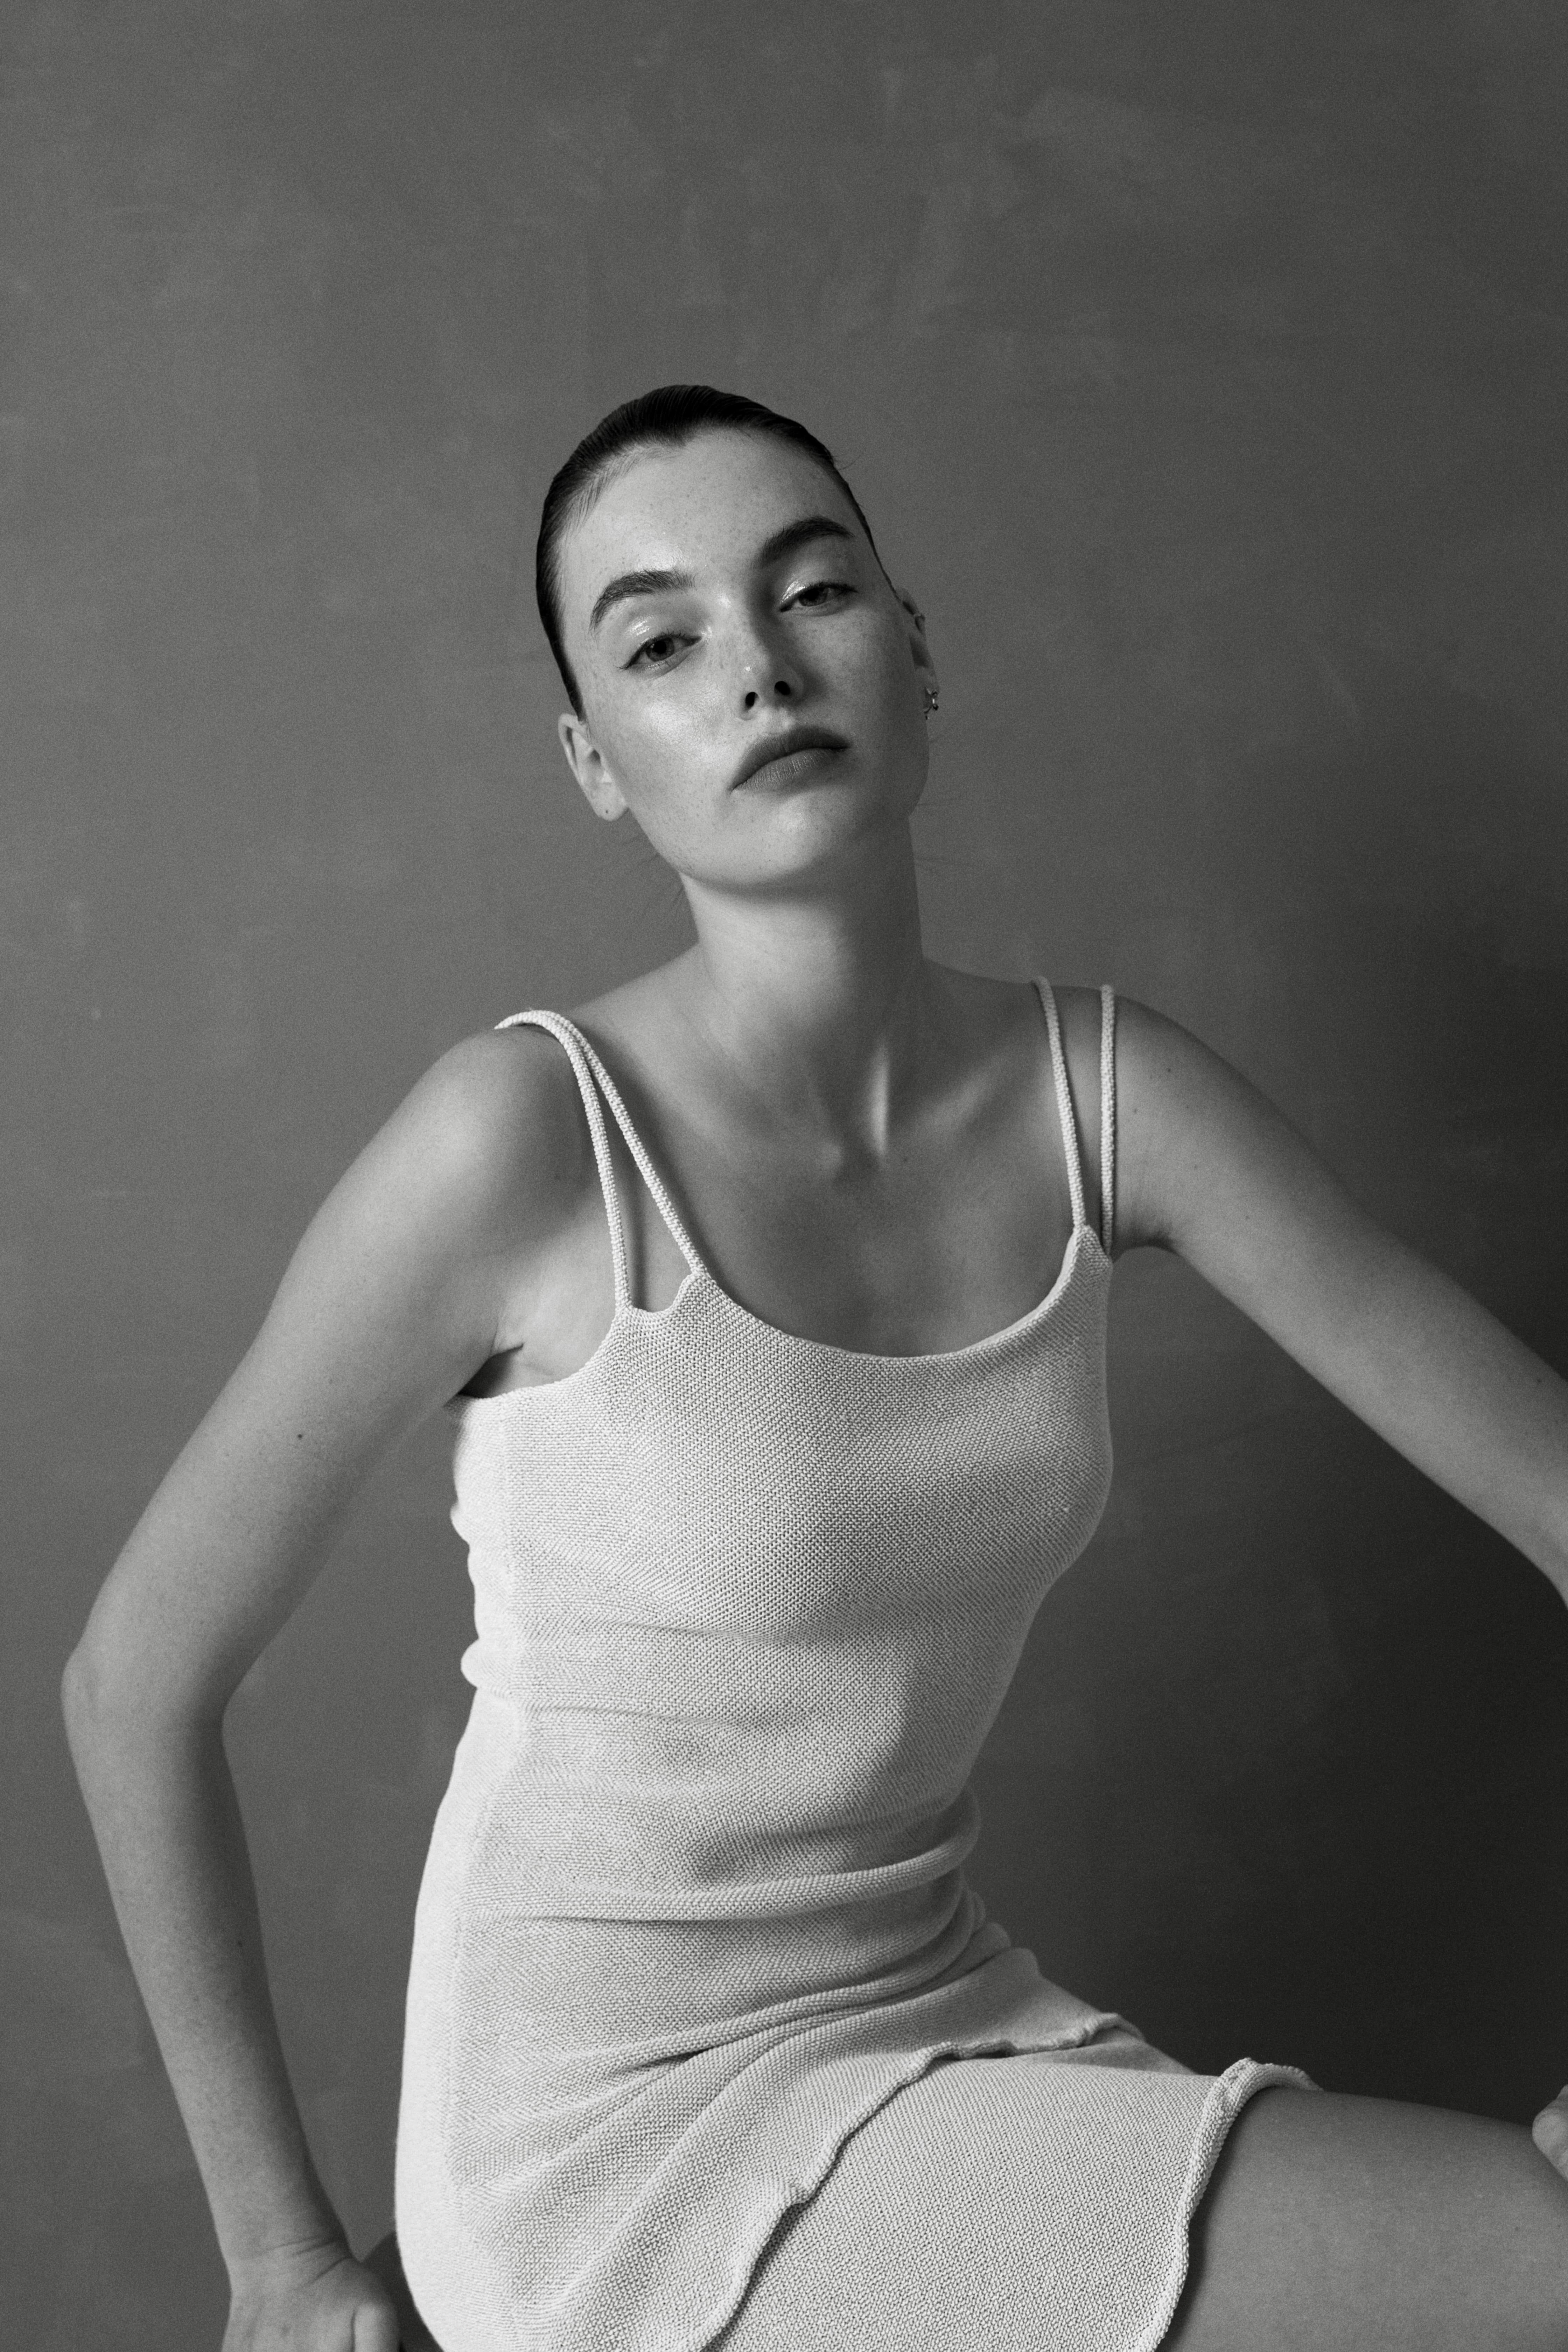 Celine bethmann germanys next top model